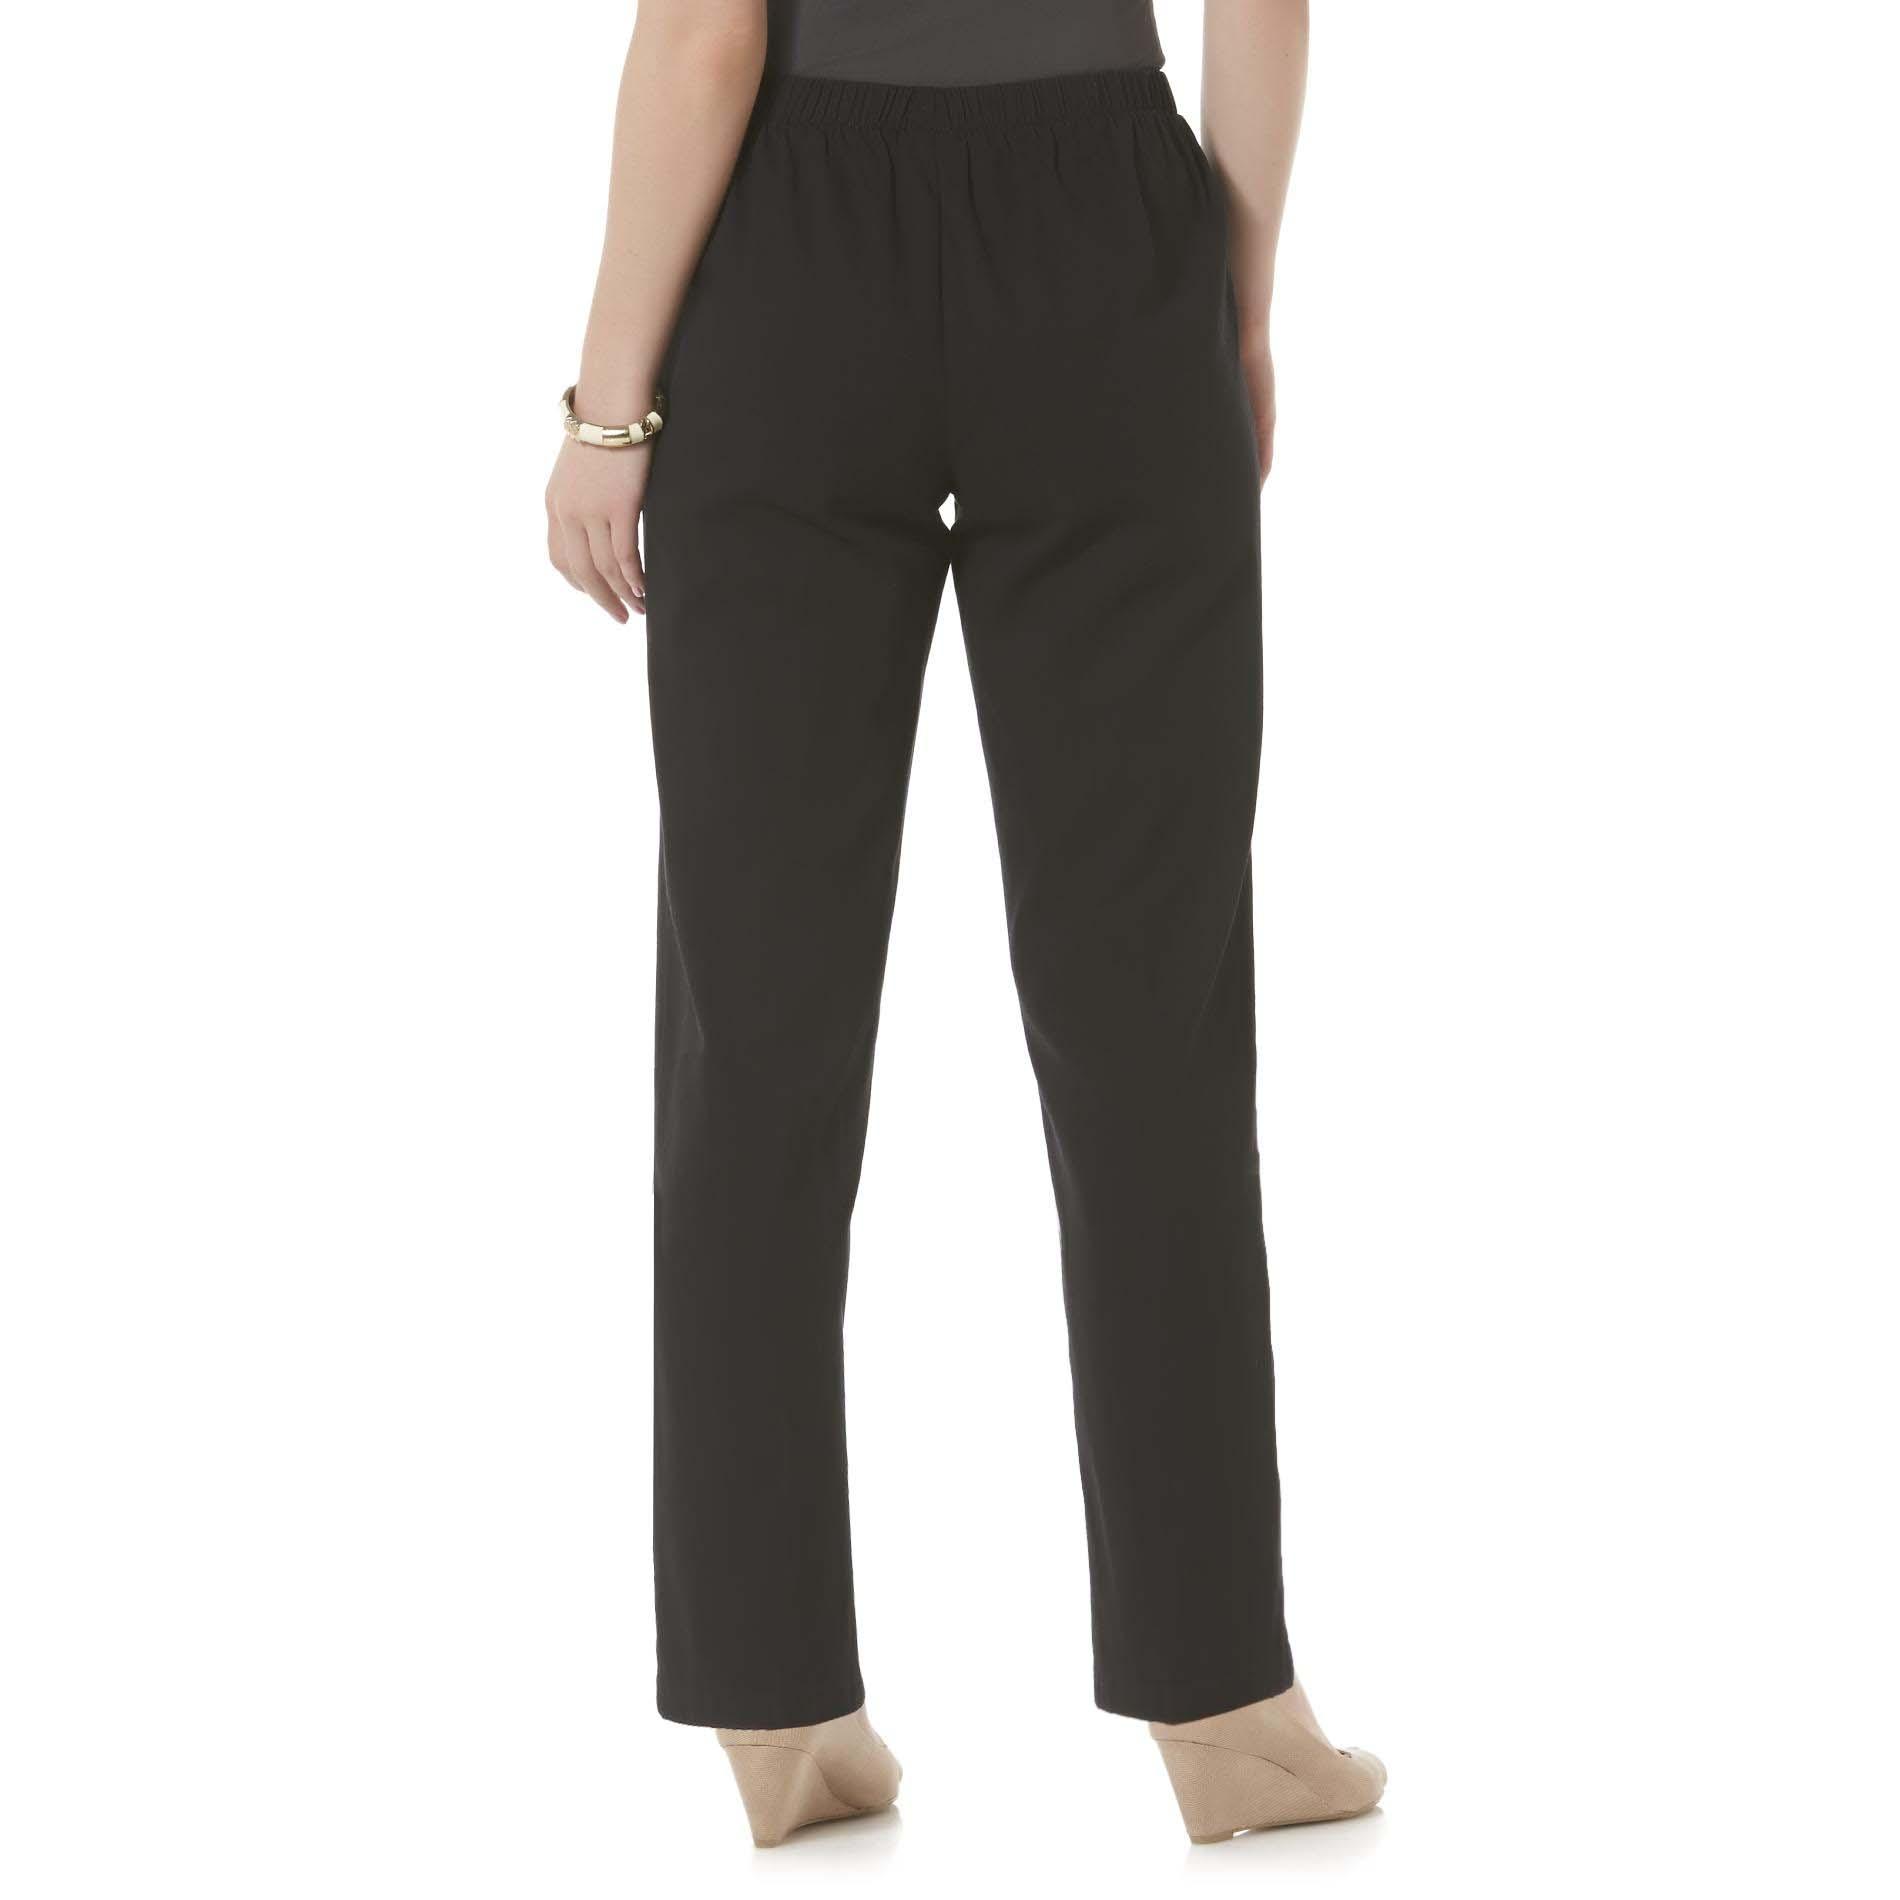 Laura Scott Petite's Elastic Waist Pants